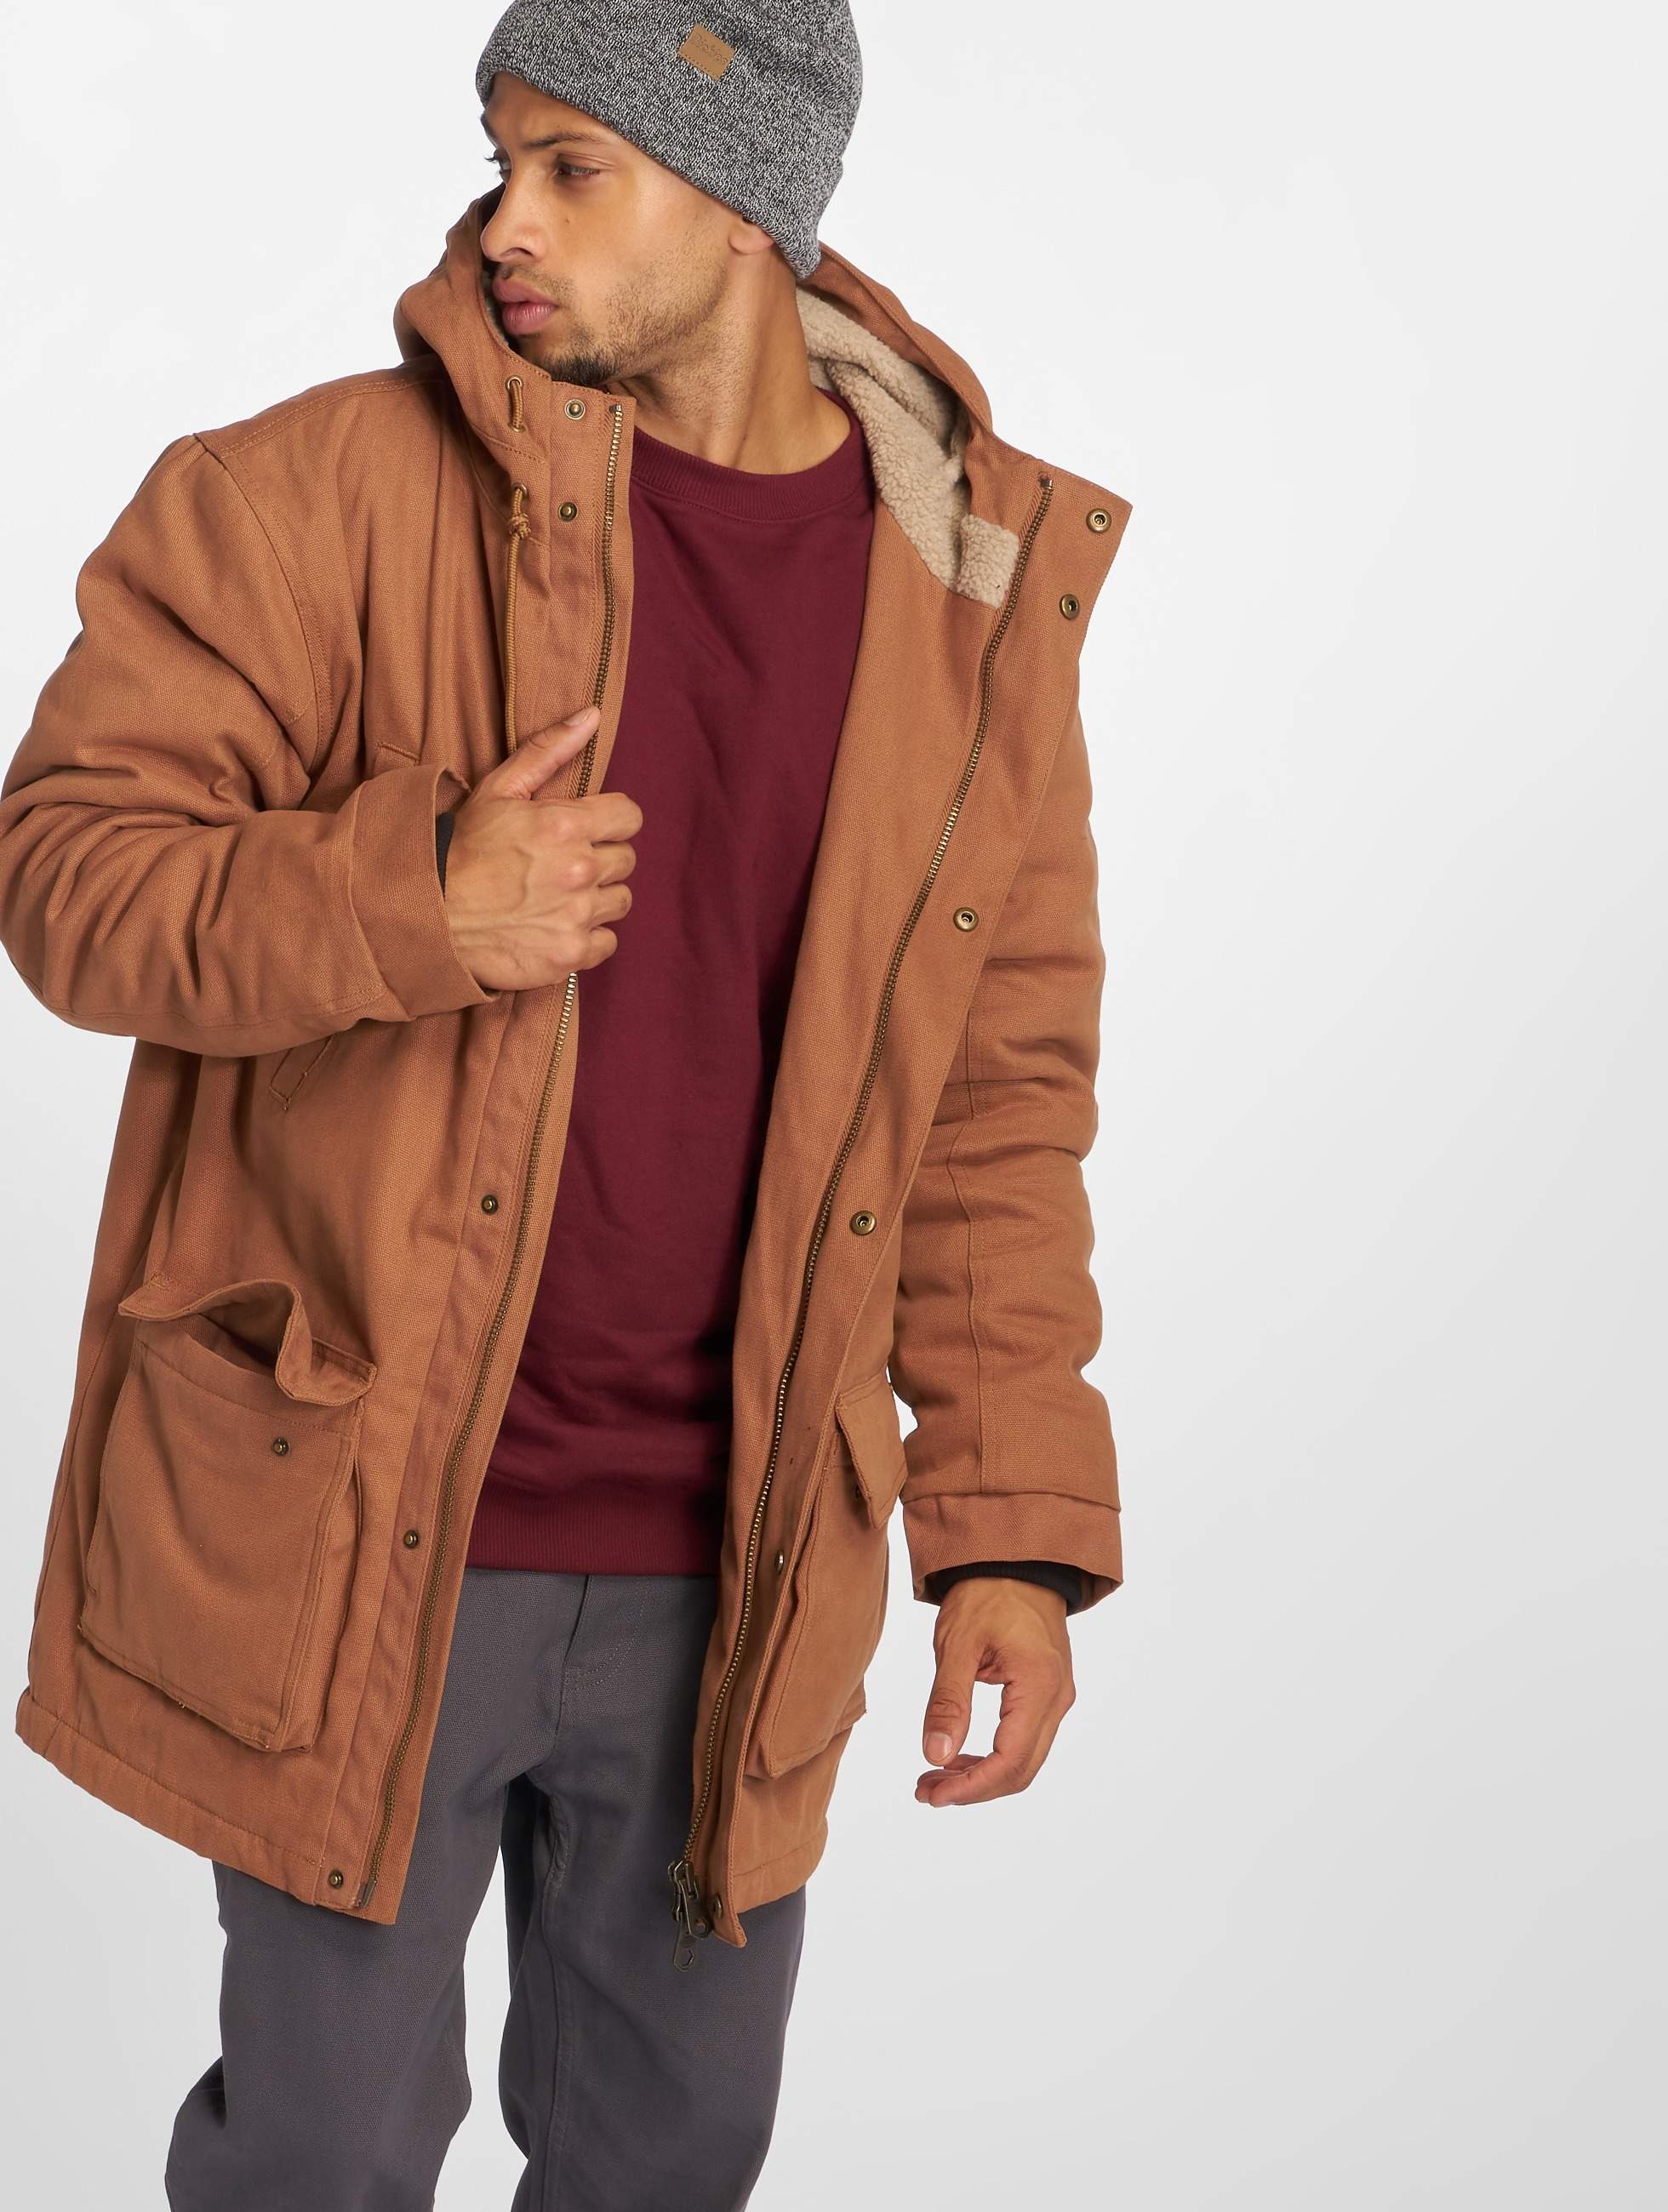 new product 866bd 2f94f Dickies Kenbridge Parka Jacket Pecan